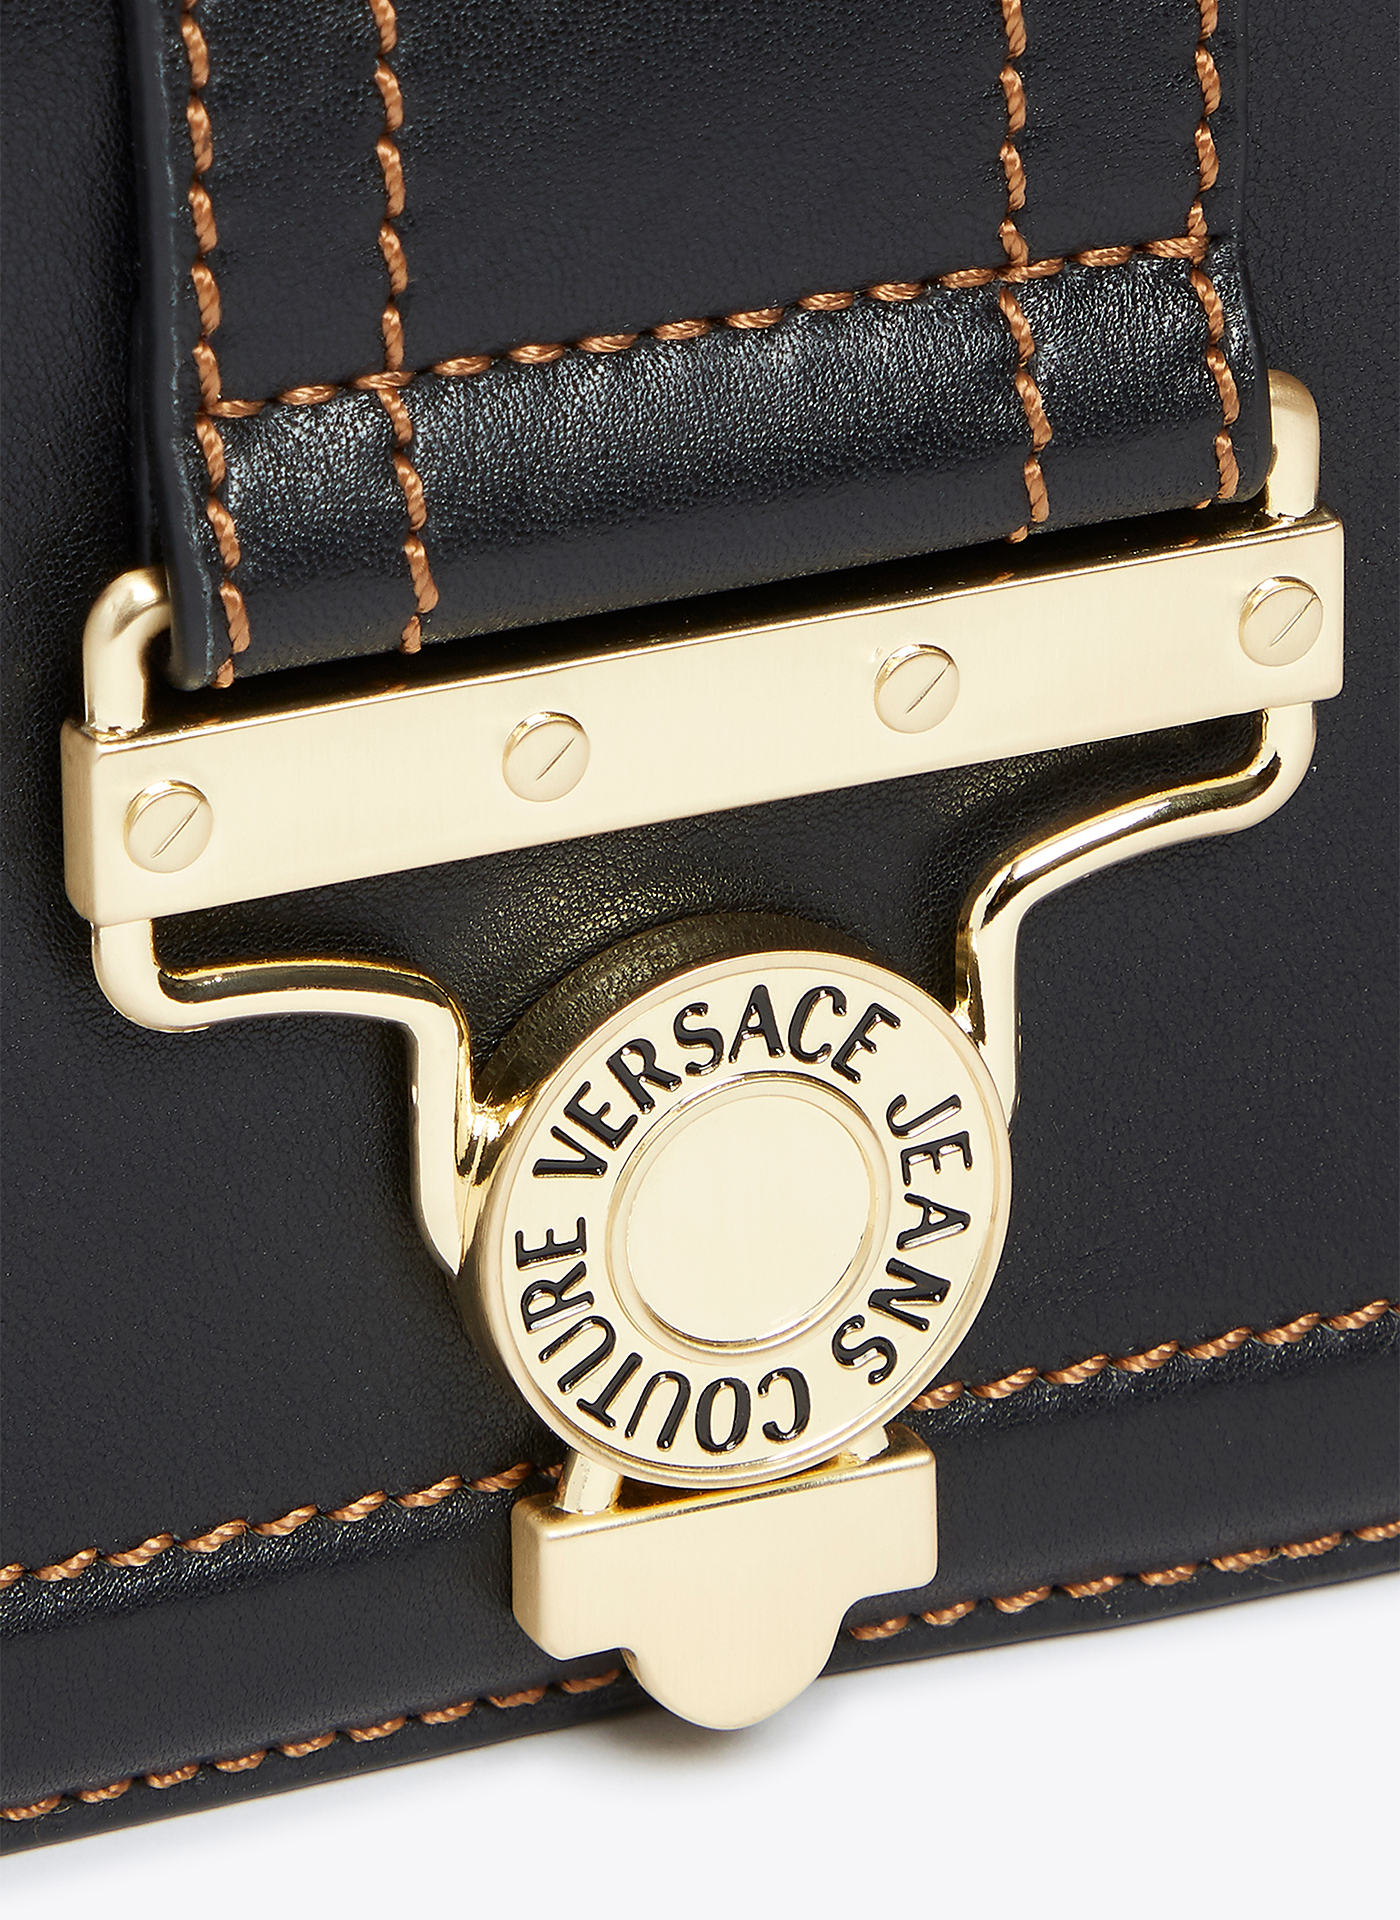 close up of the shot of black and gold versace handbag